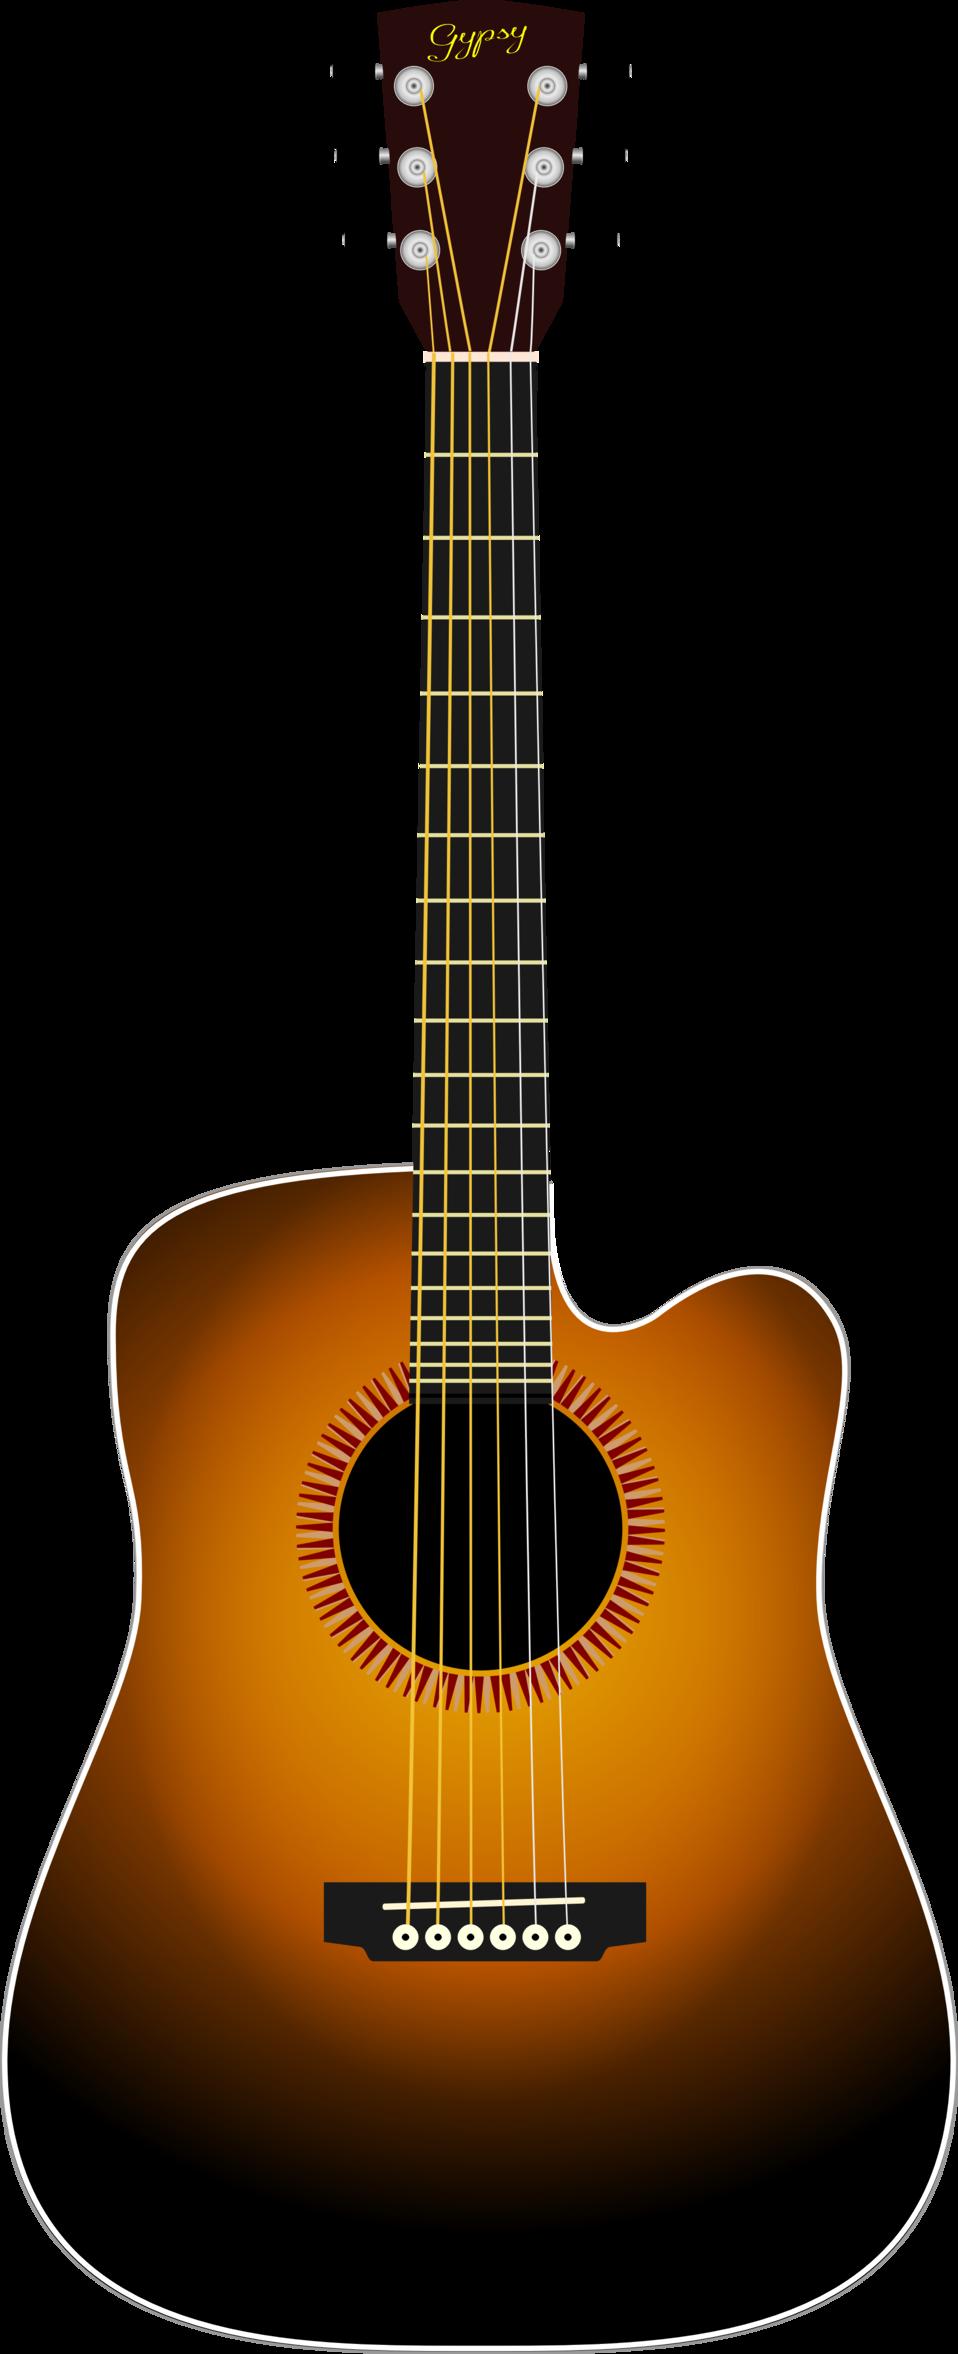 Clip art image cutaway. Clipart guitar public domain